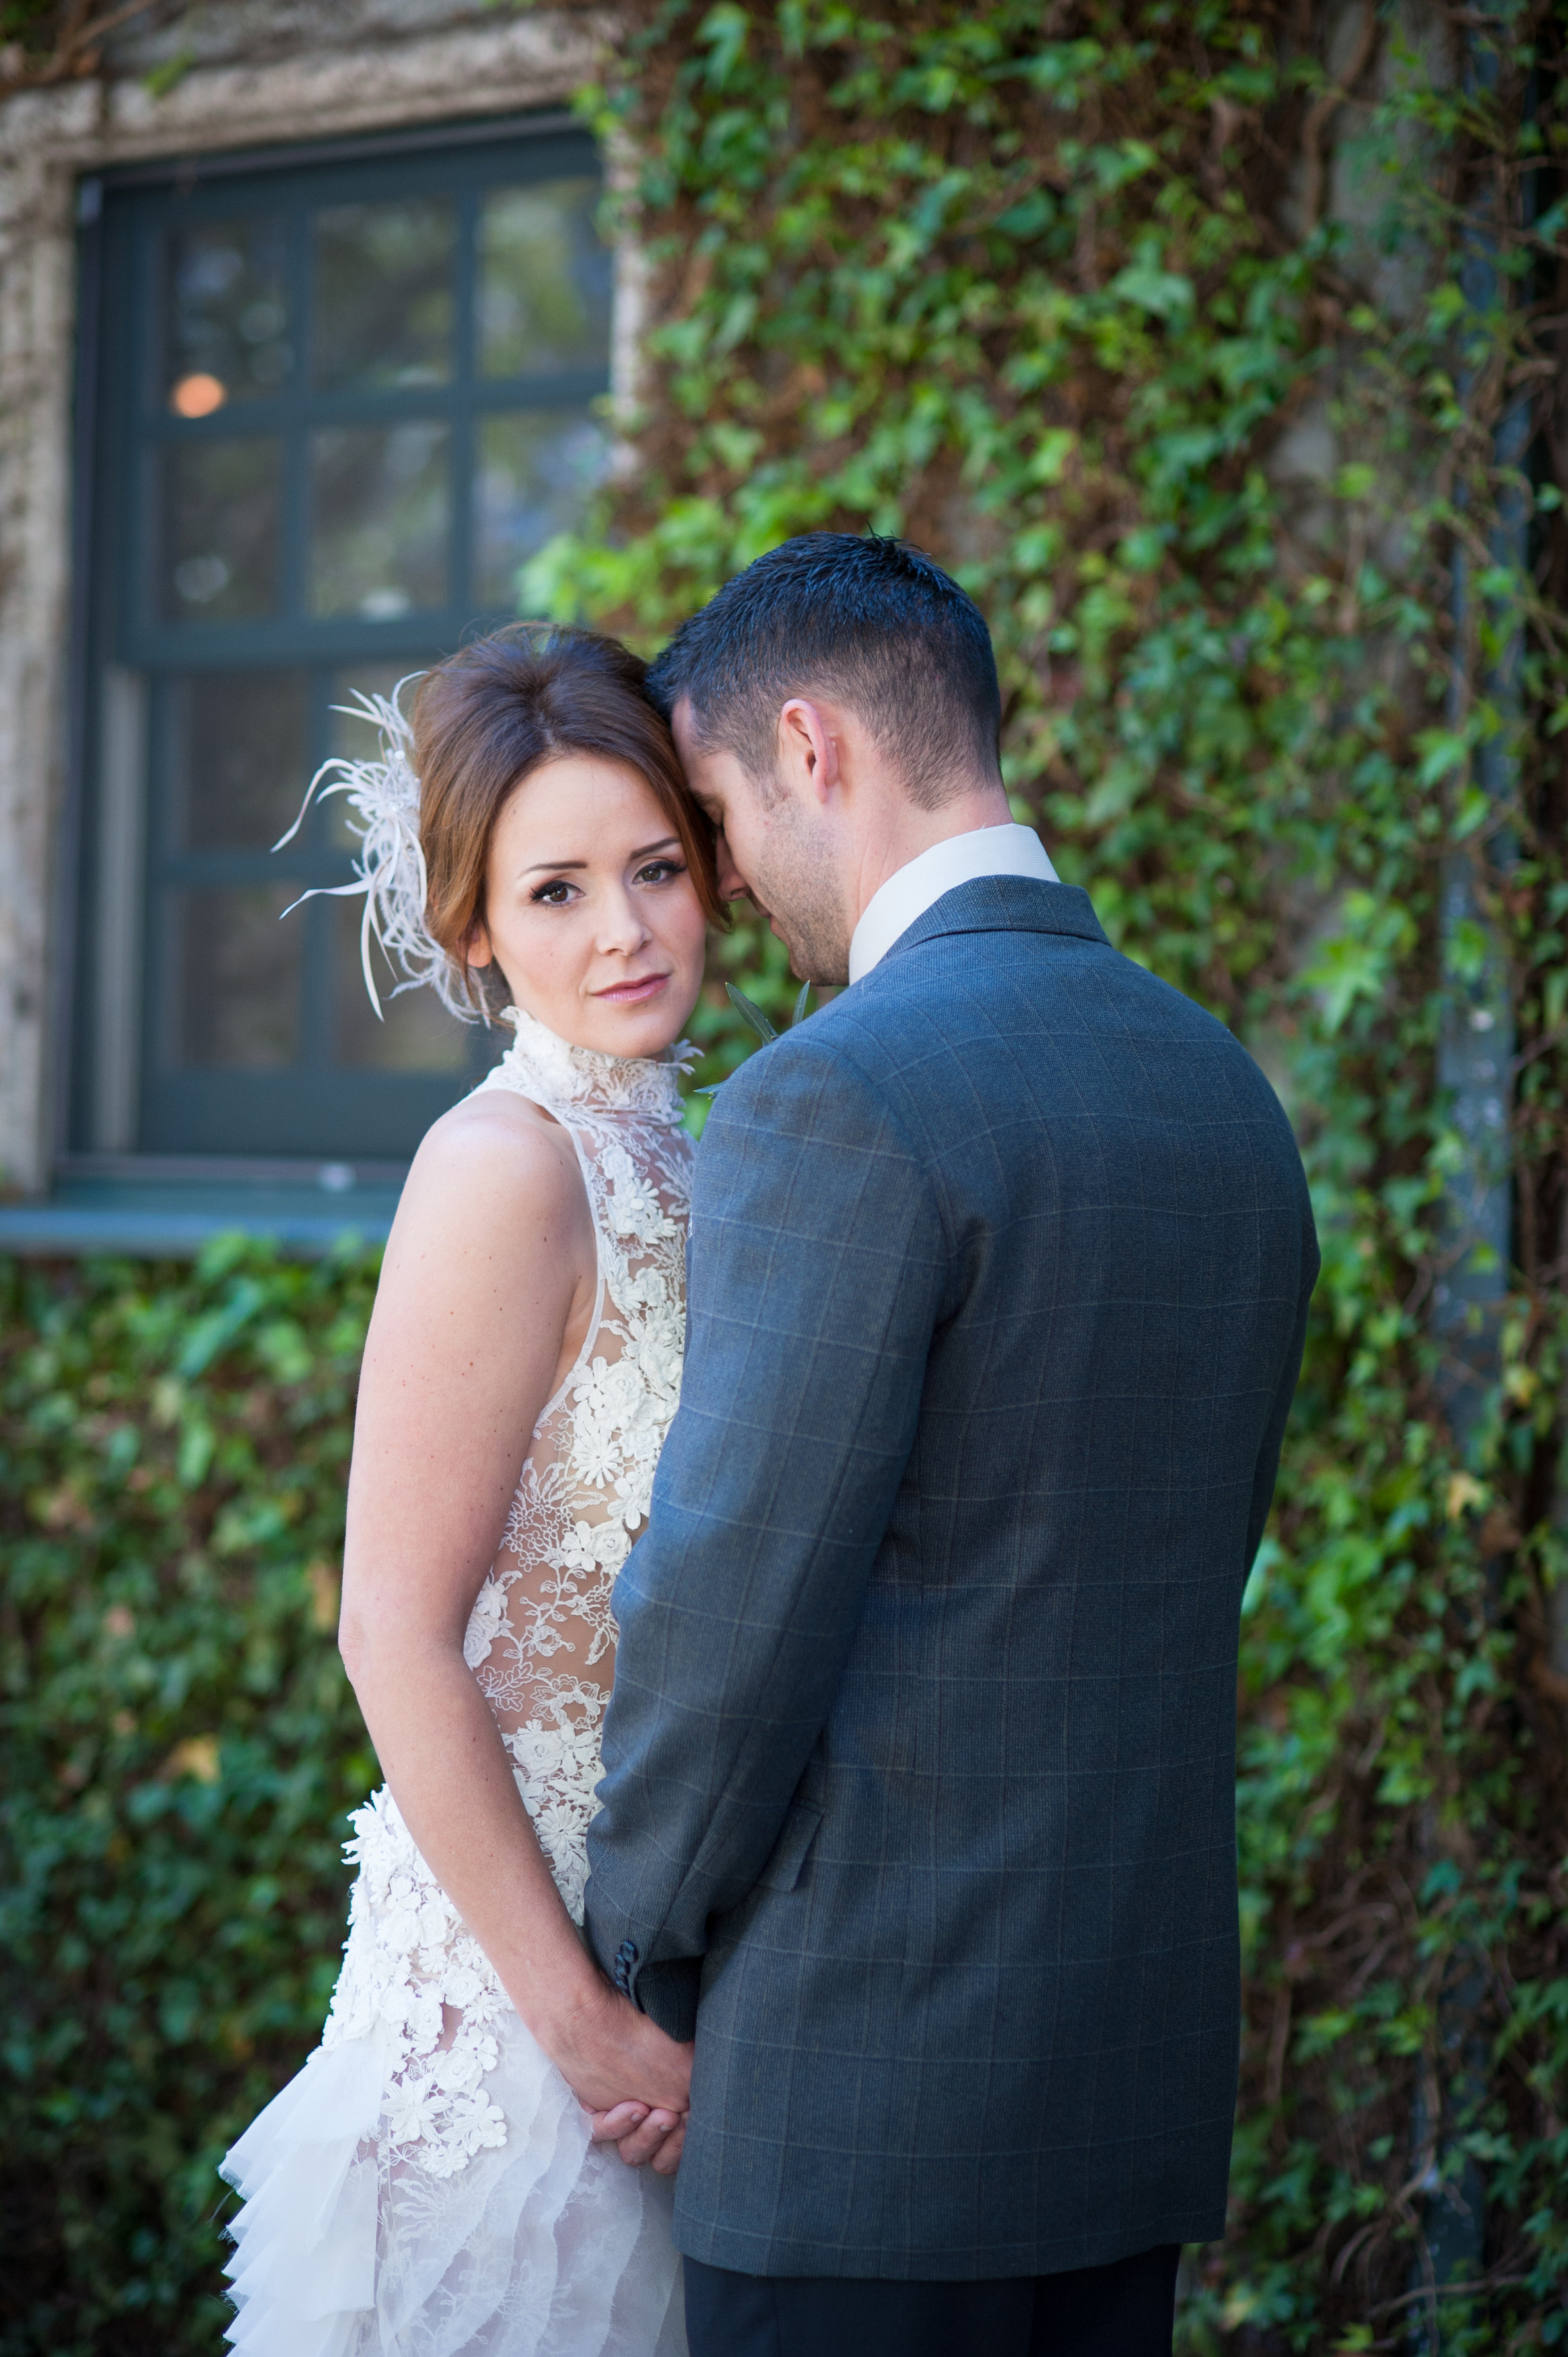 Mindy_Erik_Kenwood_Inn_Sonoma_Wedding_0120.jpg